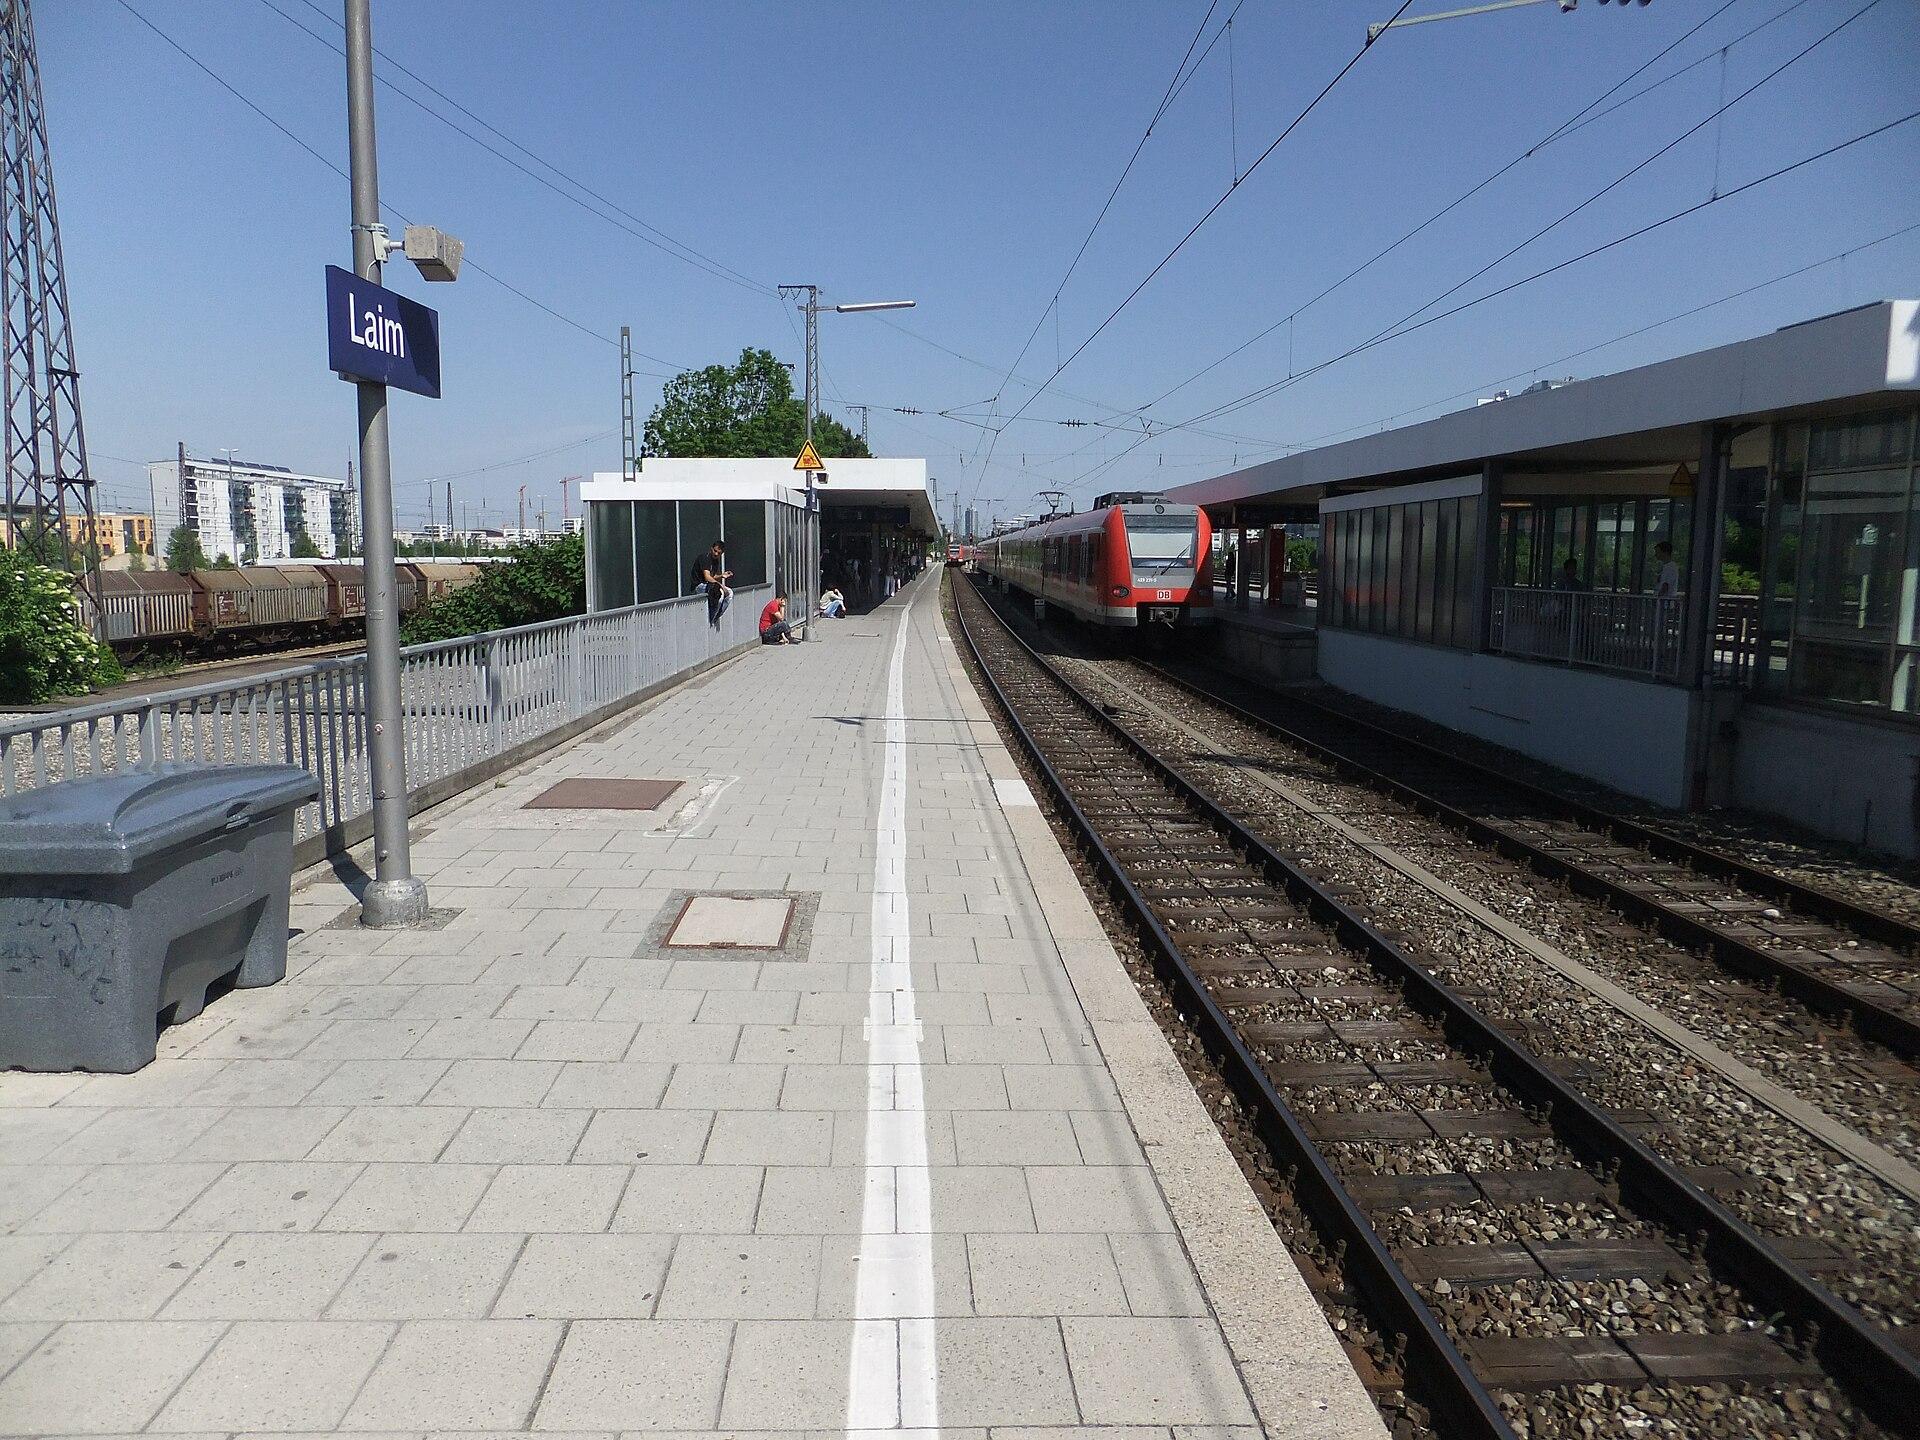 K Chenstudio M Nchen munich laim station